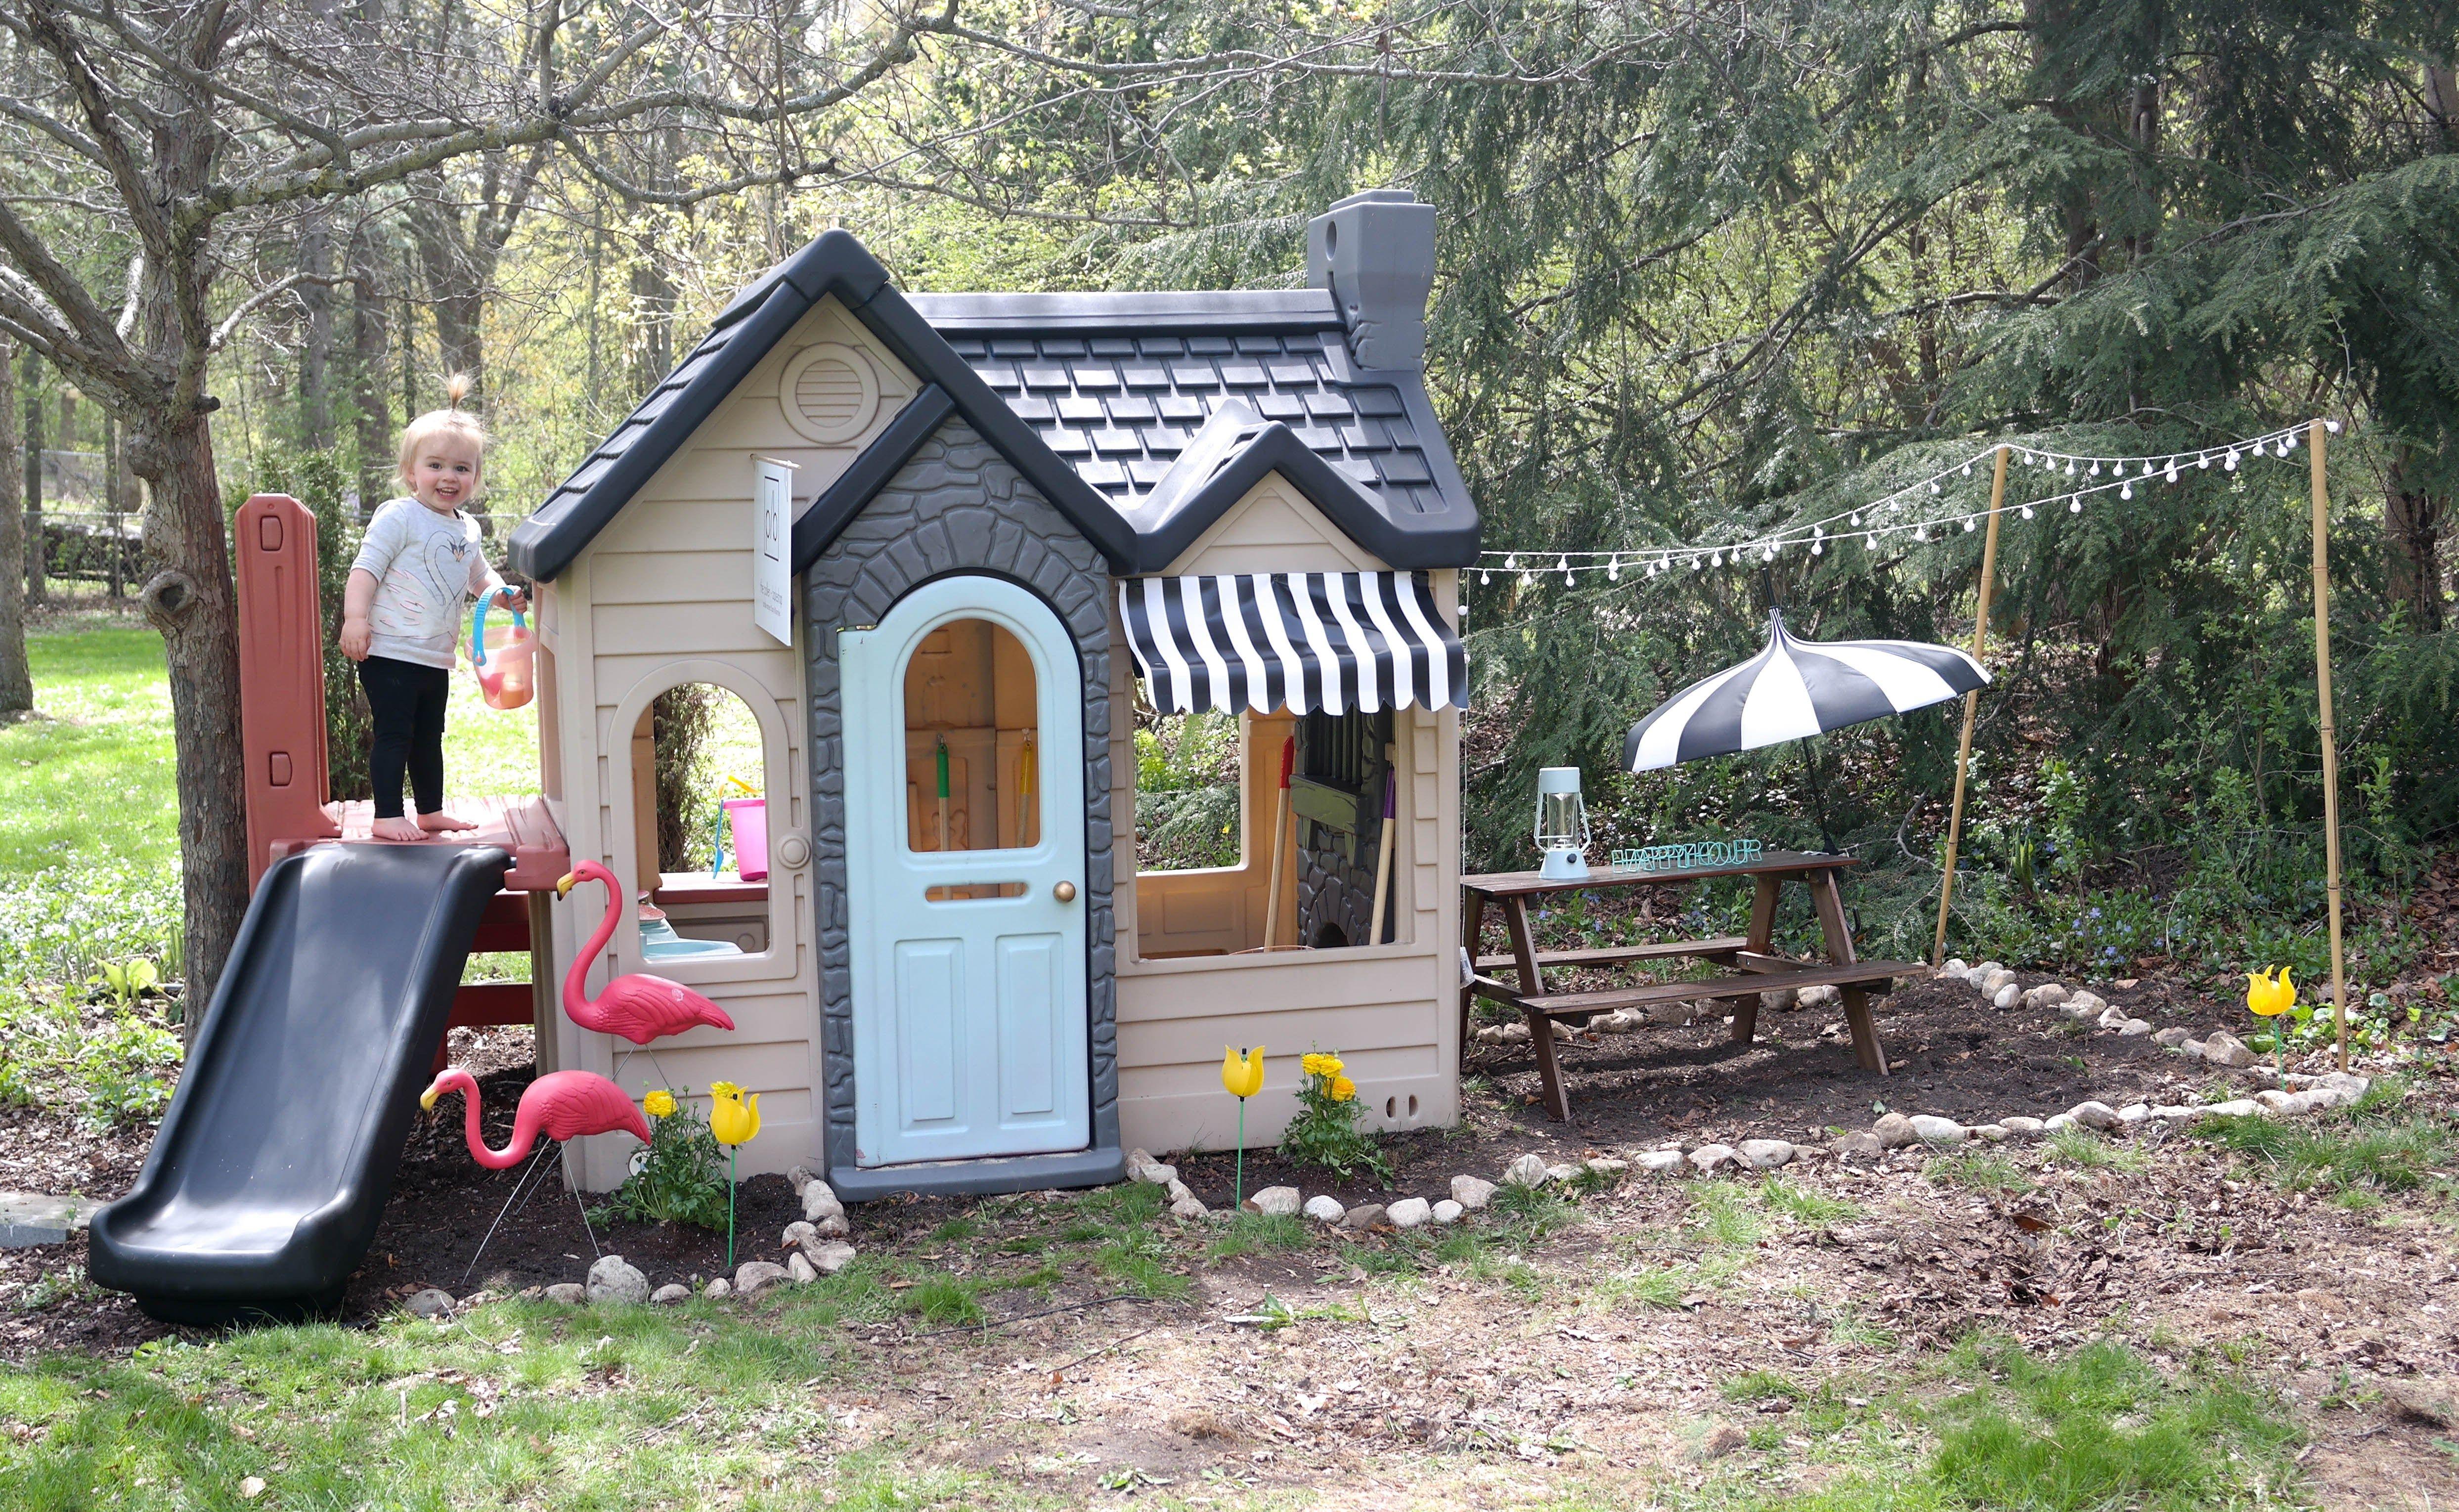 Sam 2298 Jpg 4 974 3 059 Pixels Little Tykes Playhouse Play Houses Backyard Play